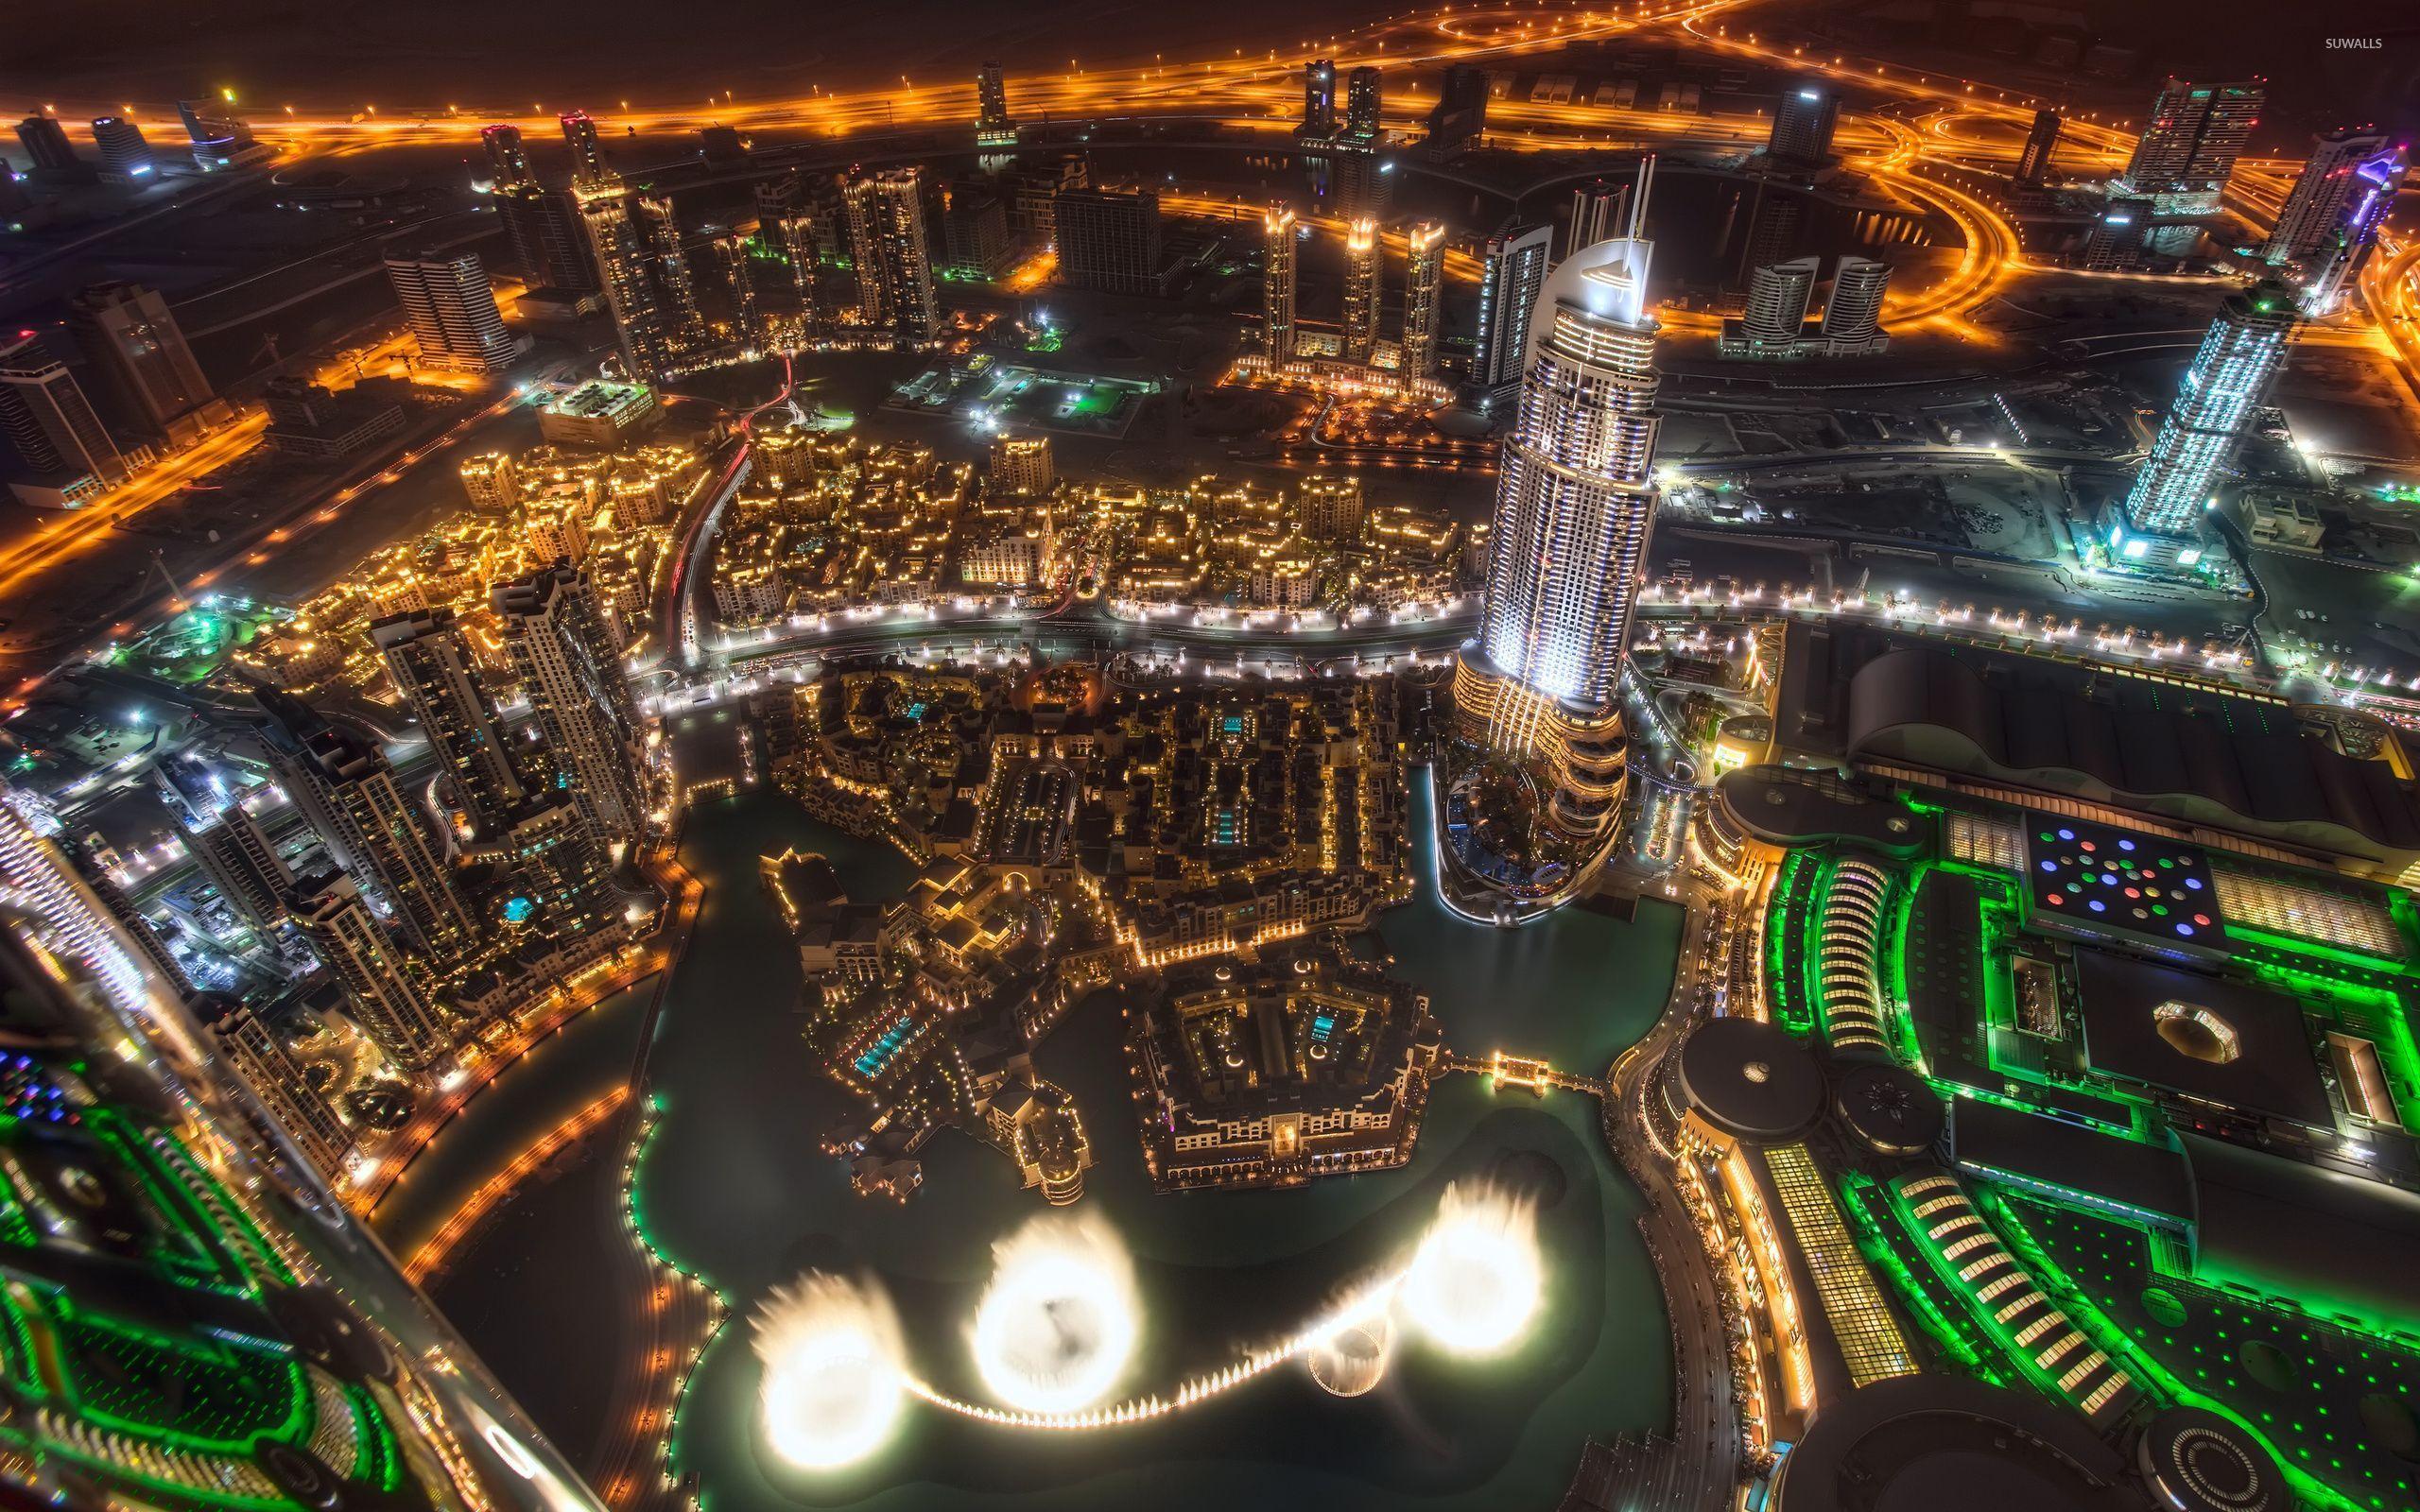 Great Wallpaper Night Dubai - dubai-at-night-32790-2560x1600  HD-653236.jpg